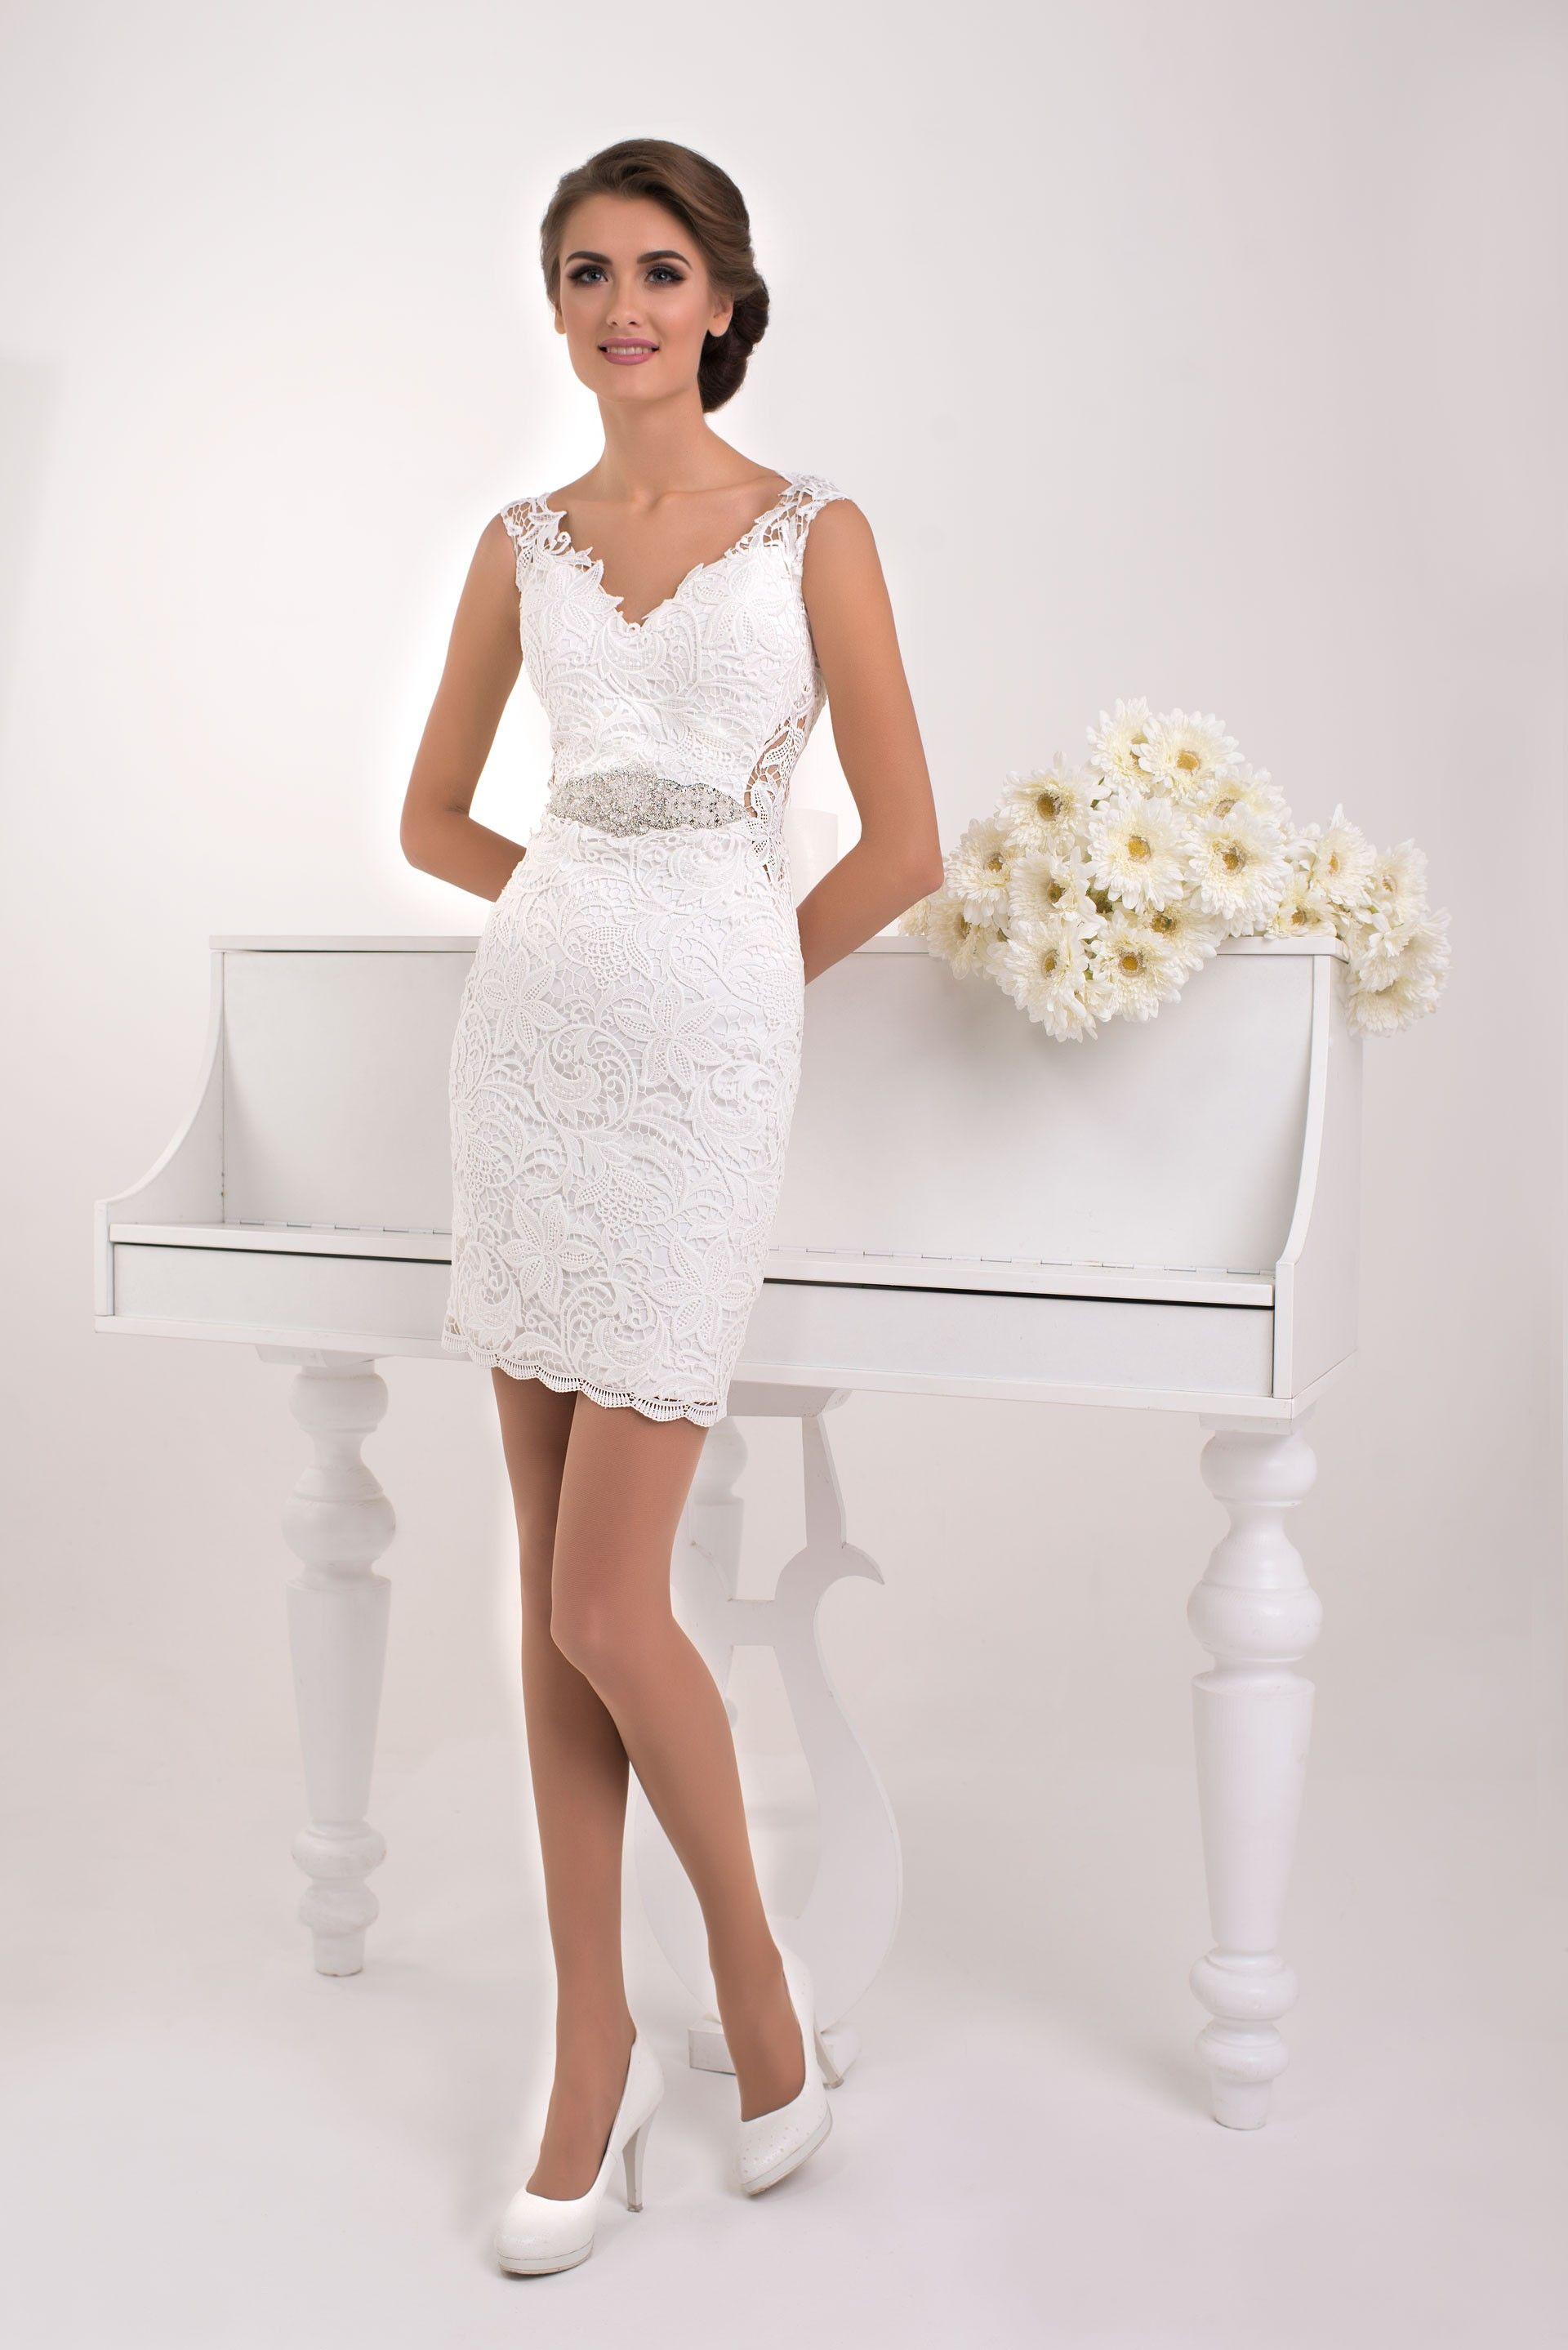 85342a08dcb5 Elegantné krátke čipkované svadobné šaty s pripínatelnou sukňou ...